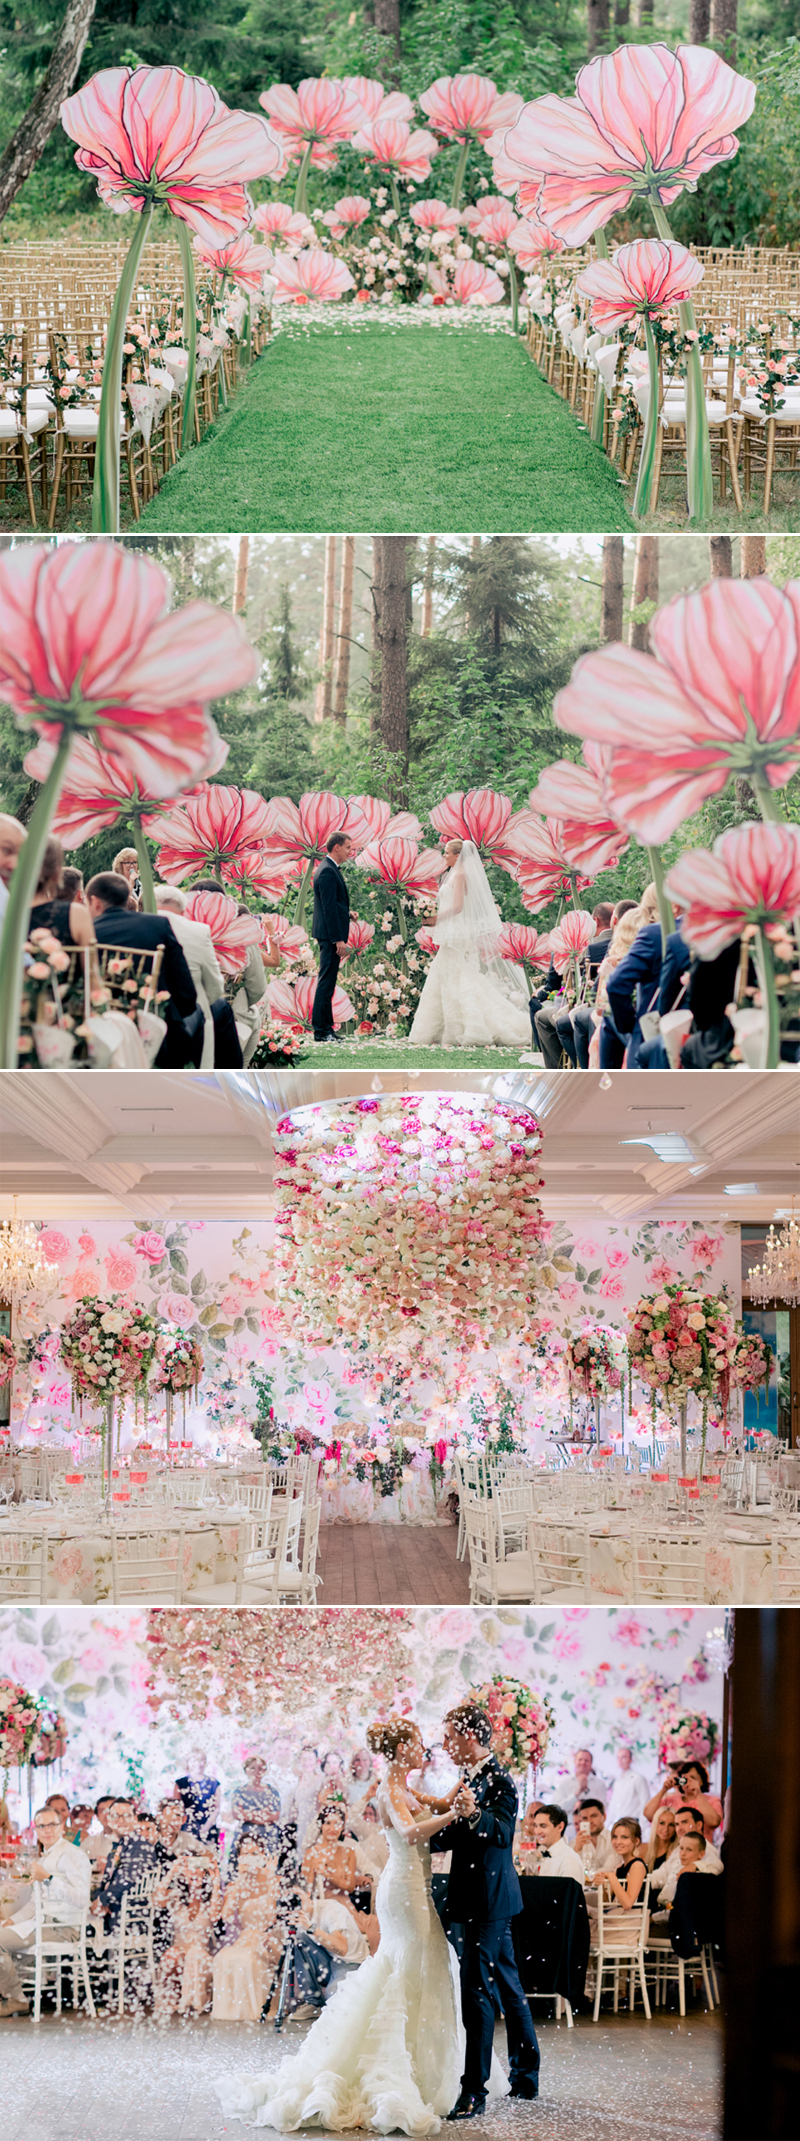 7 Incredibly Magical Themes For Spring Fairytale Weddings  Praise Wedding